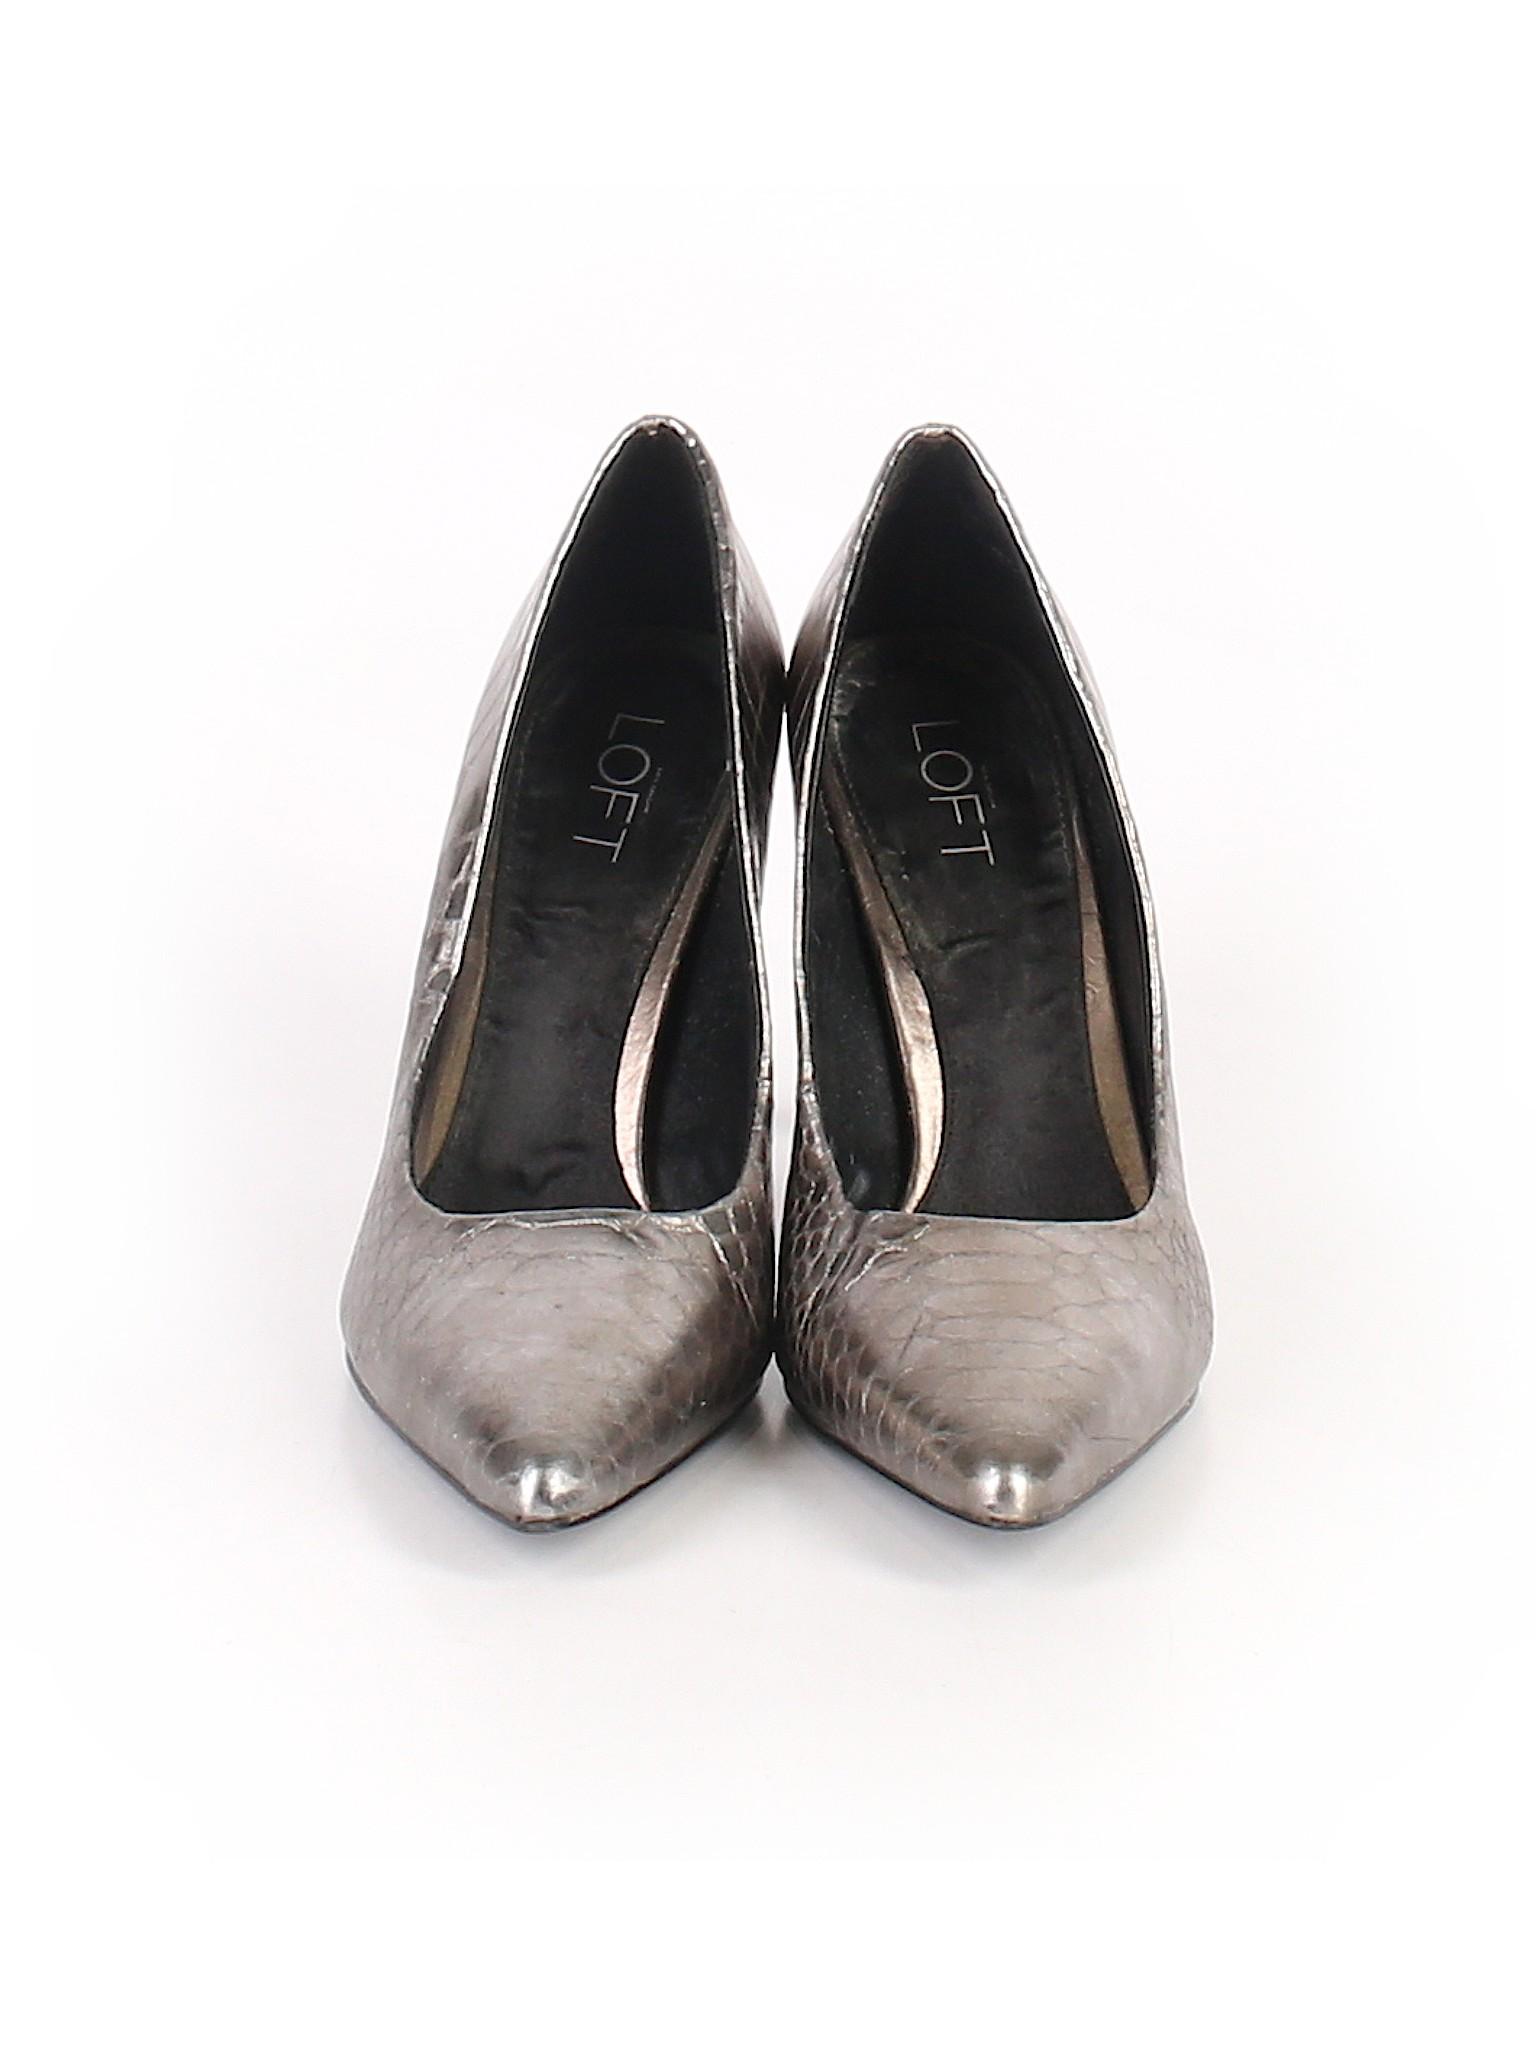 Taylor Boutique Ann promotion Heels LOFT wBaSq4nw